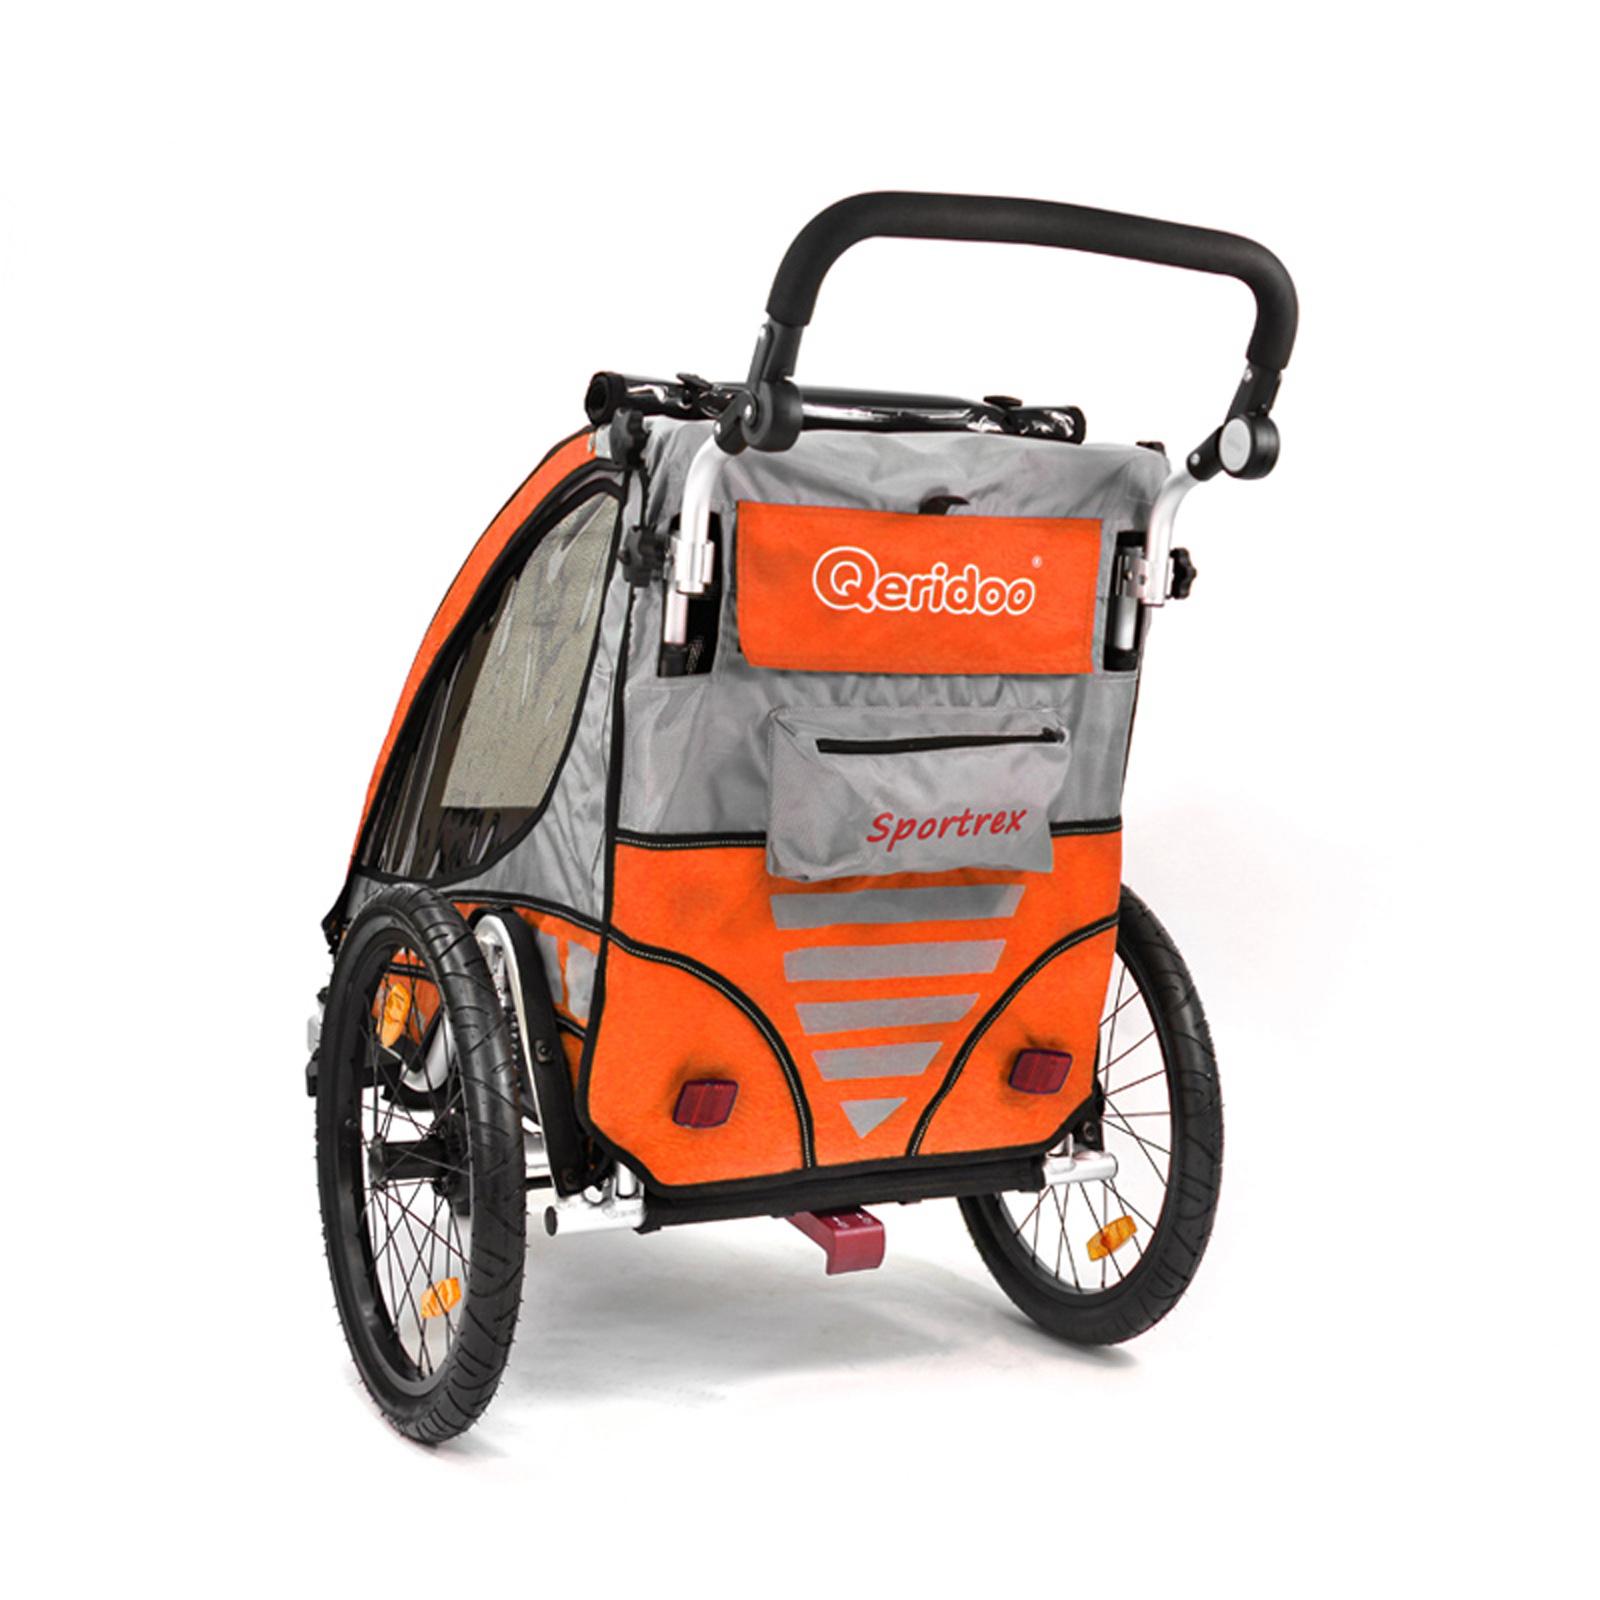 fahrradanh nger qeridoo sportrex 1 einsitzer kinderfahrradanh nger orange 2015 ebay. Black Bedroom Furniture Sets. Home Design Ideas